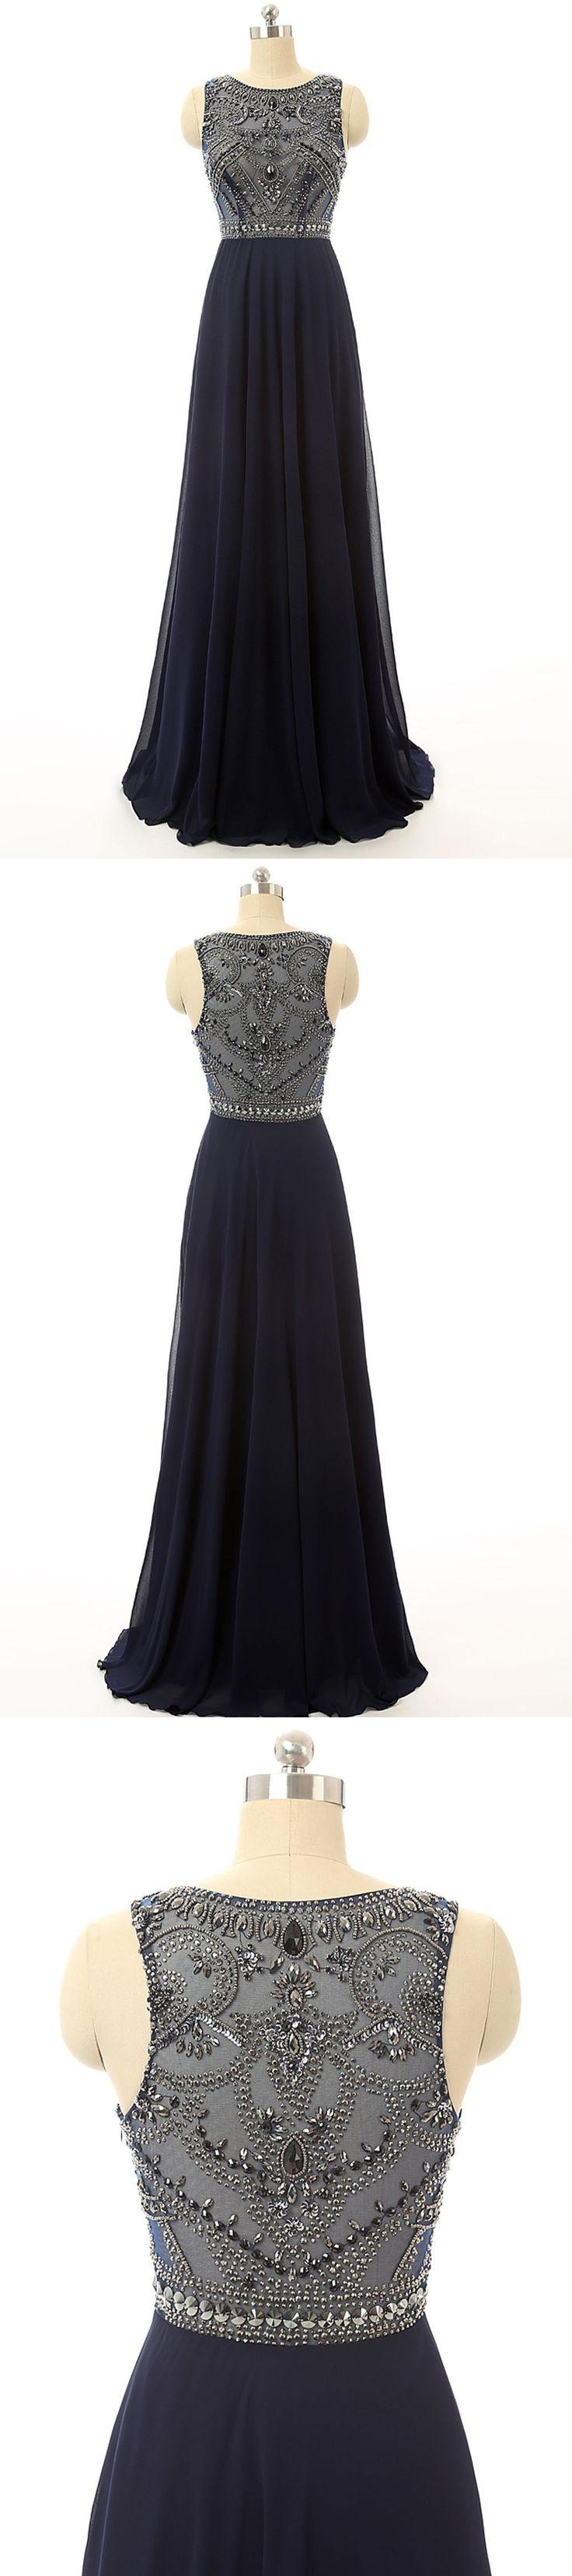 Long Prom Dresses,Cheap Prom Dress Navy Blue Beaded Long Graduation Dresses ED0849